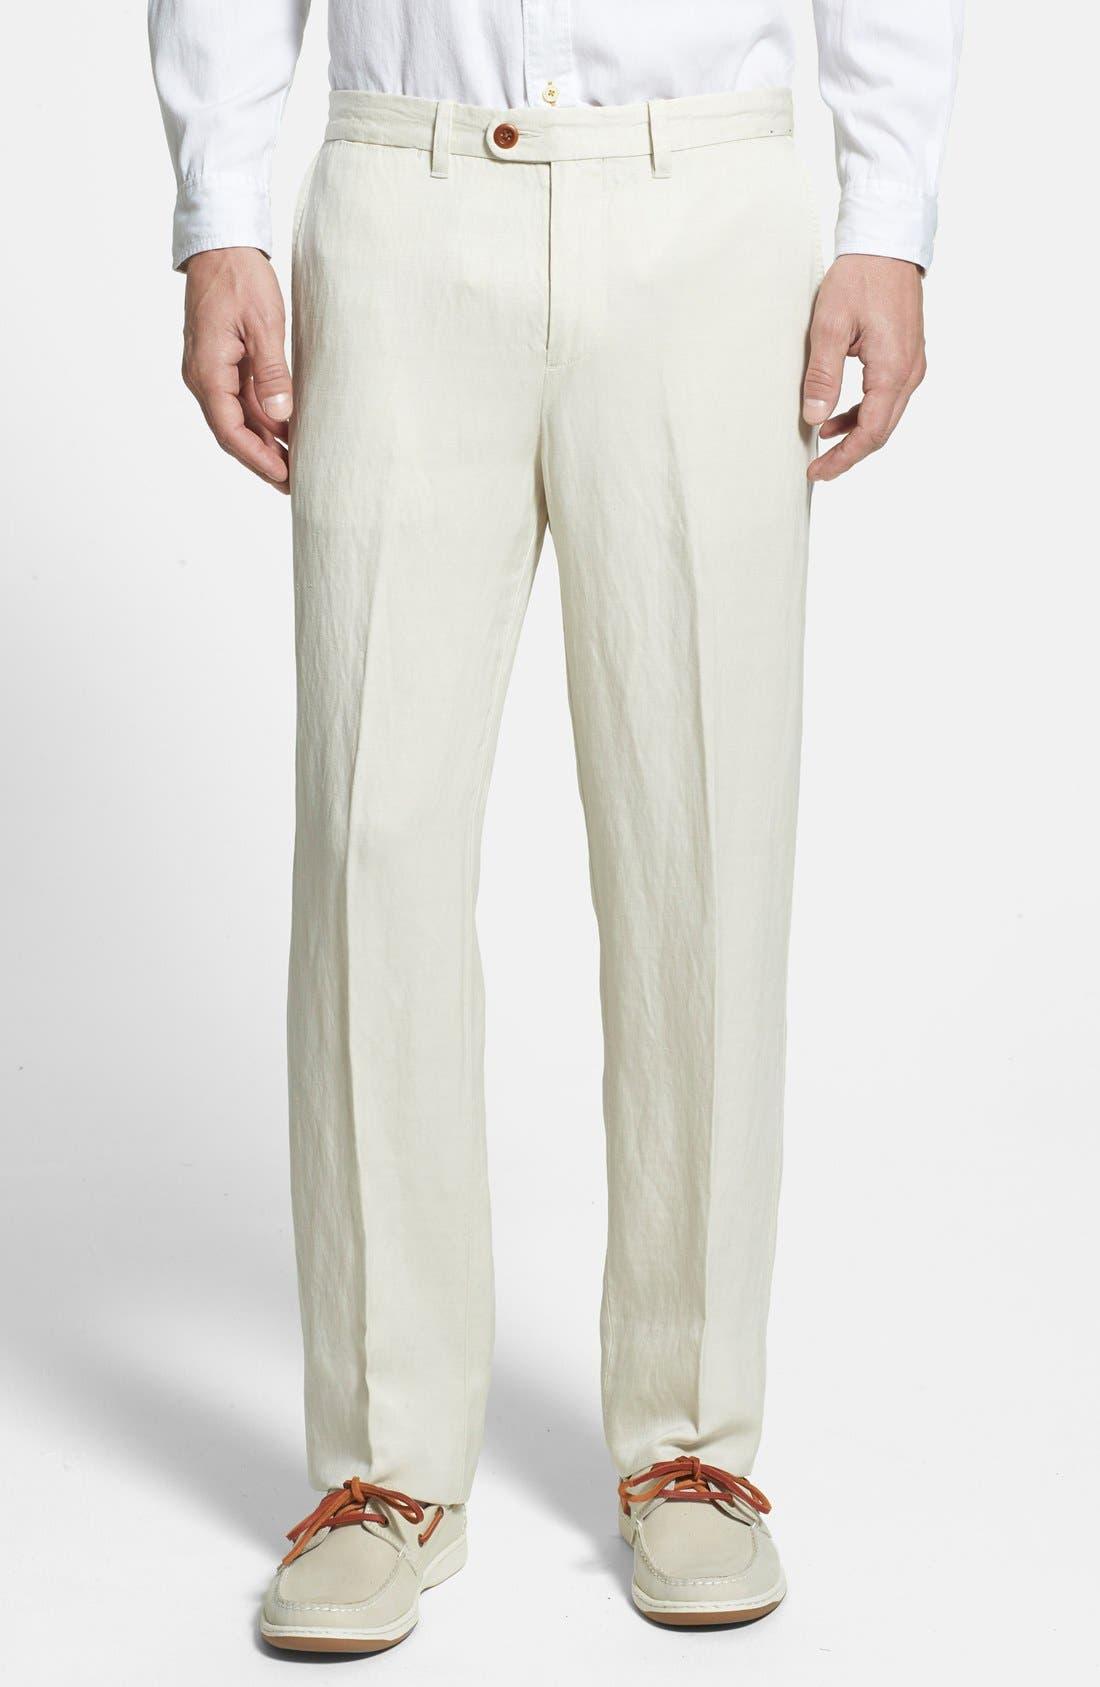 Tommy Bahama 'La Jolla' Flat Front Pants